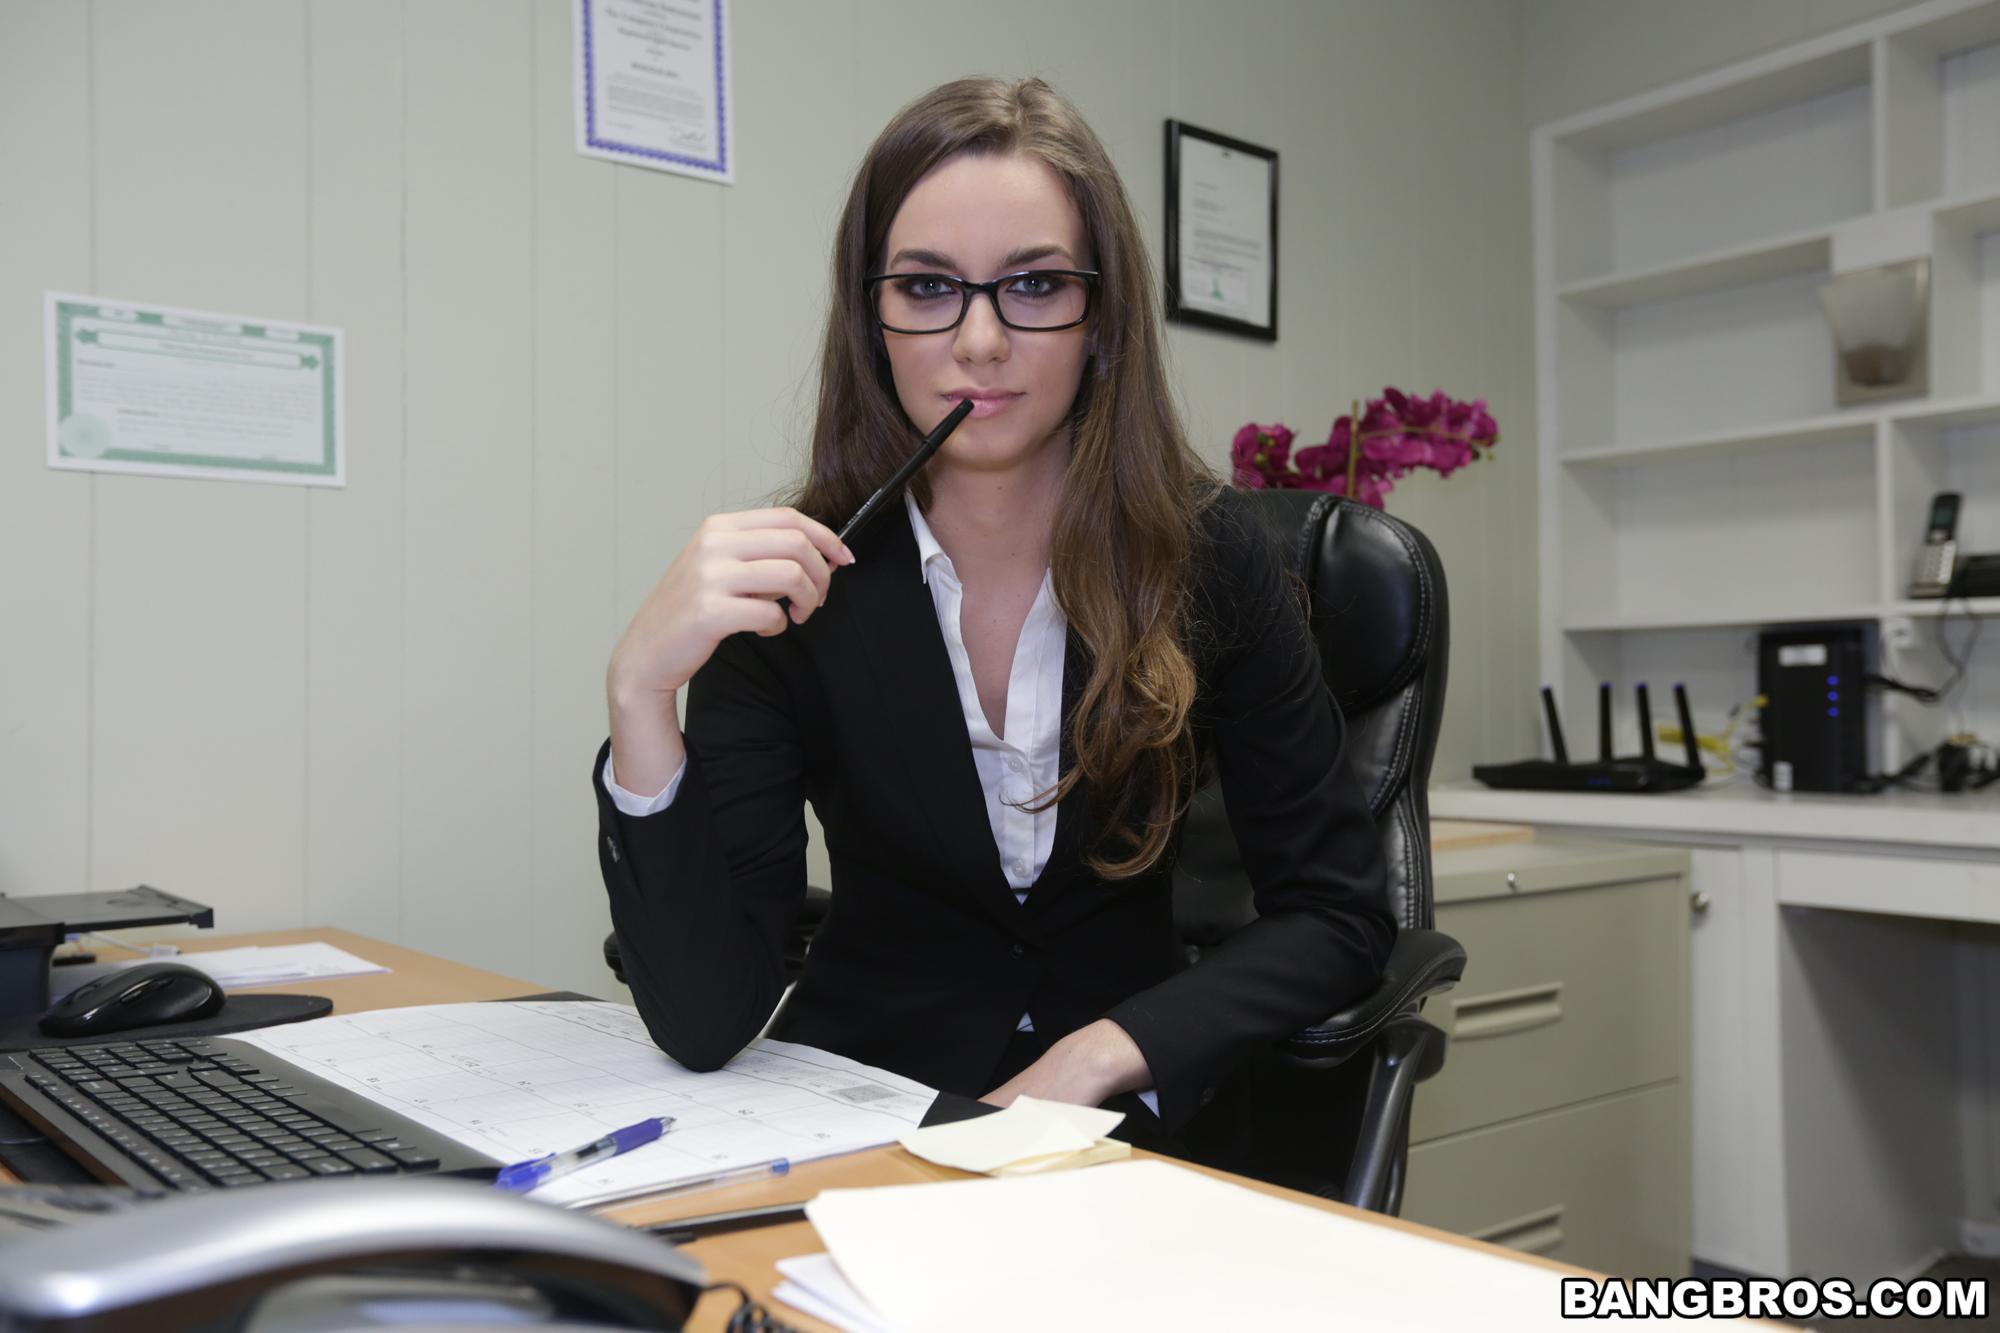 tali dova muestra su rica conchita en la oficina elgadu